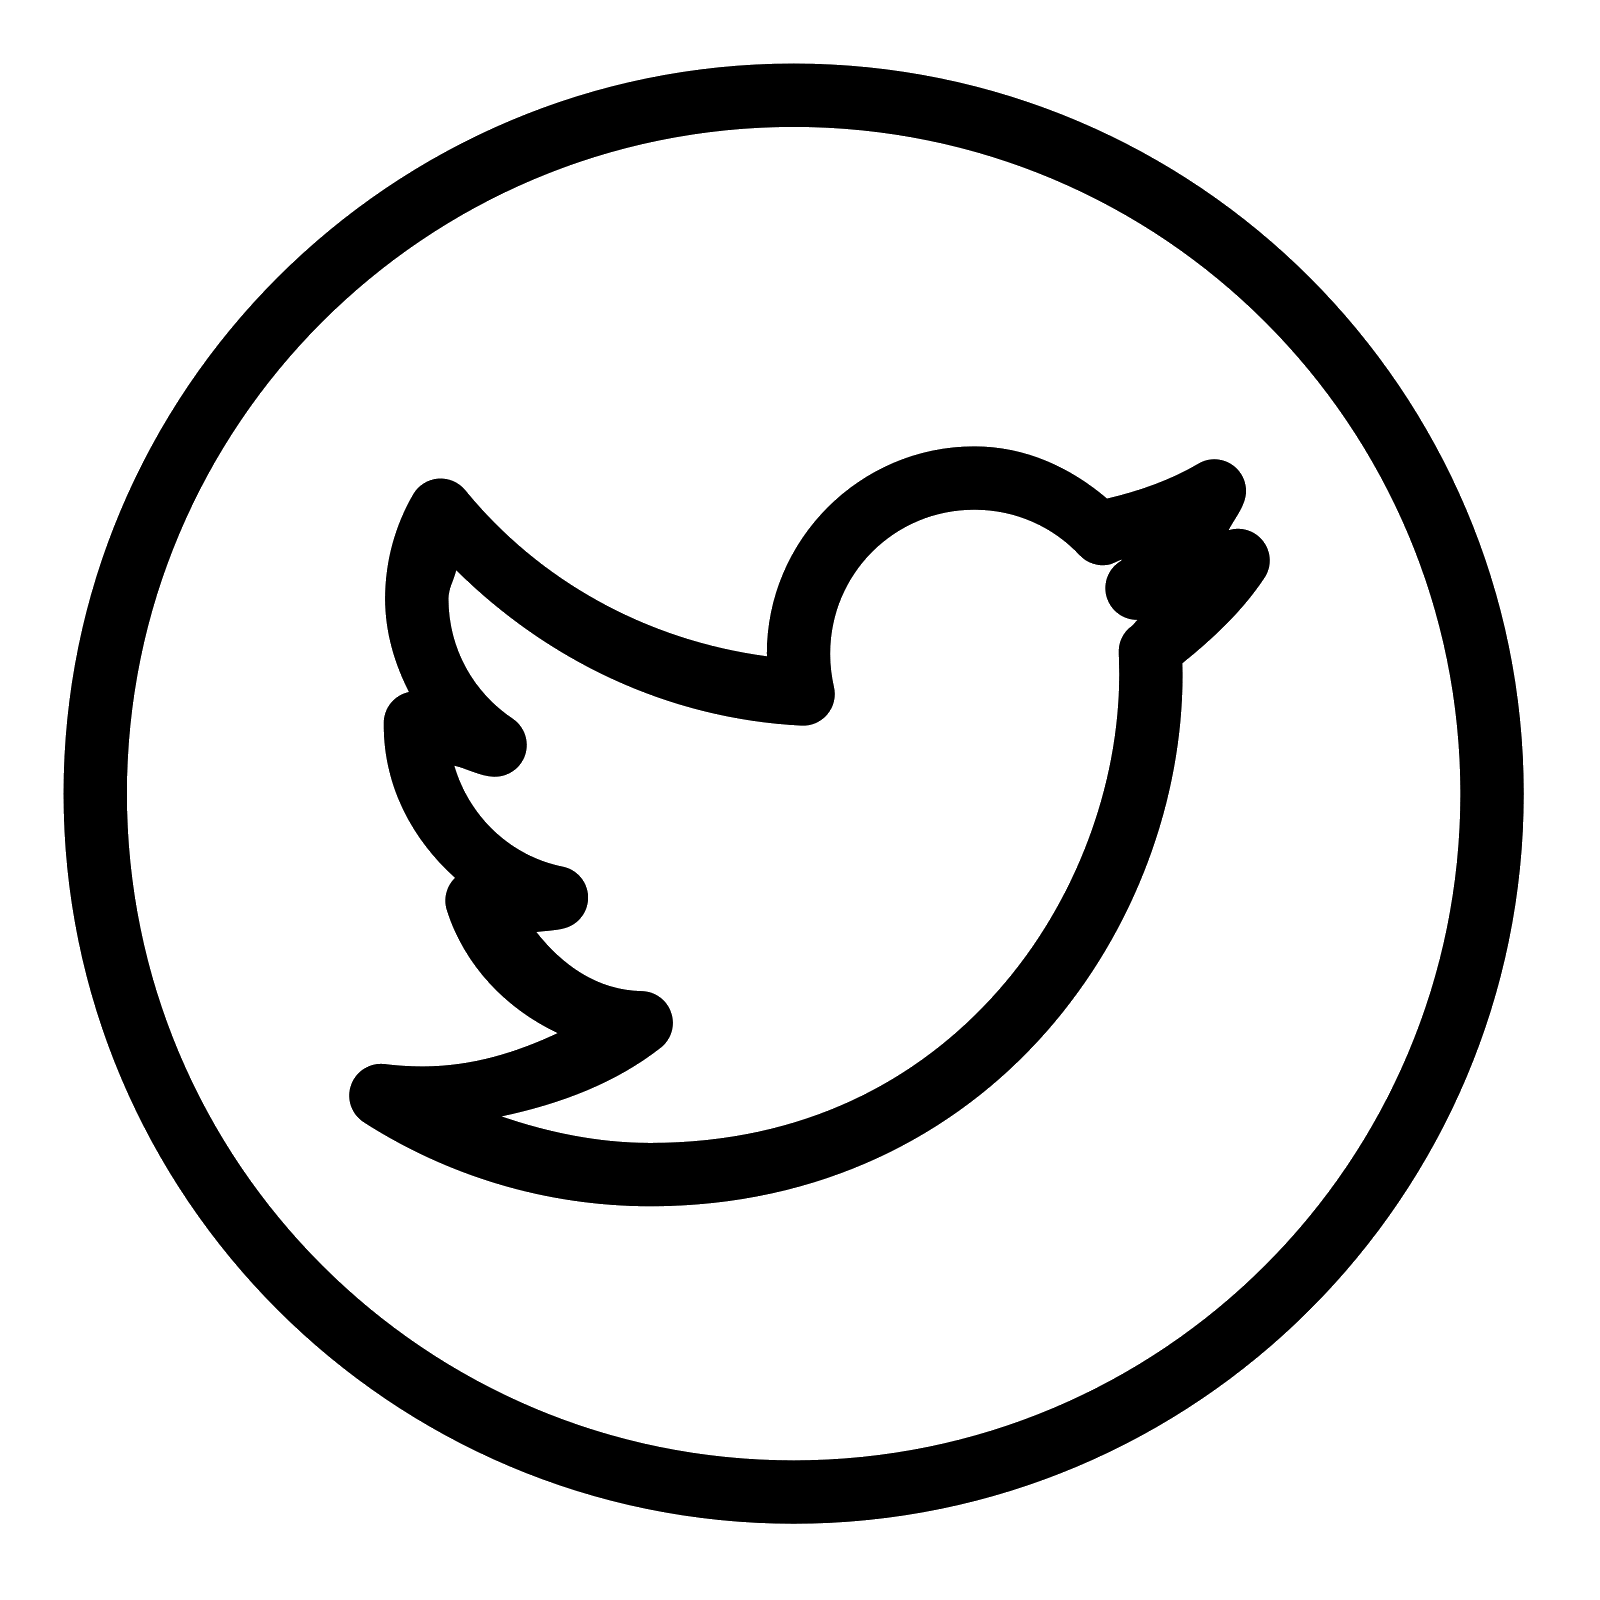 White twitter logo png.  latest icon gif